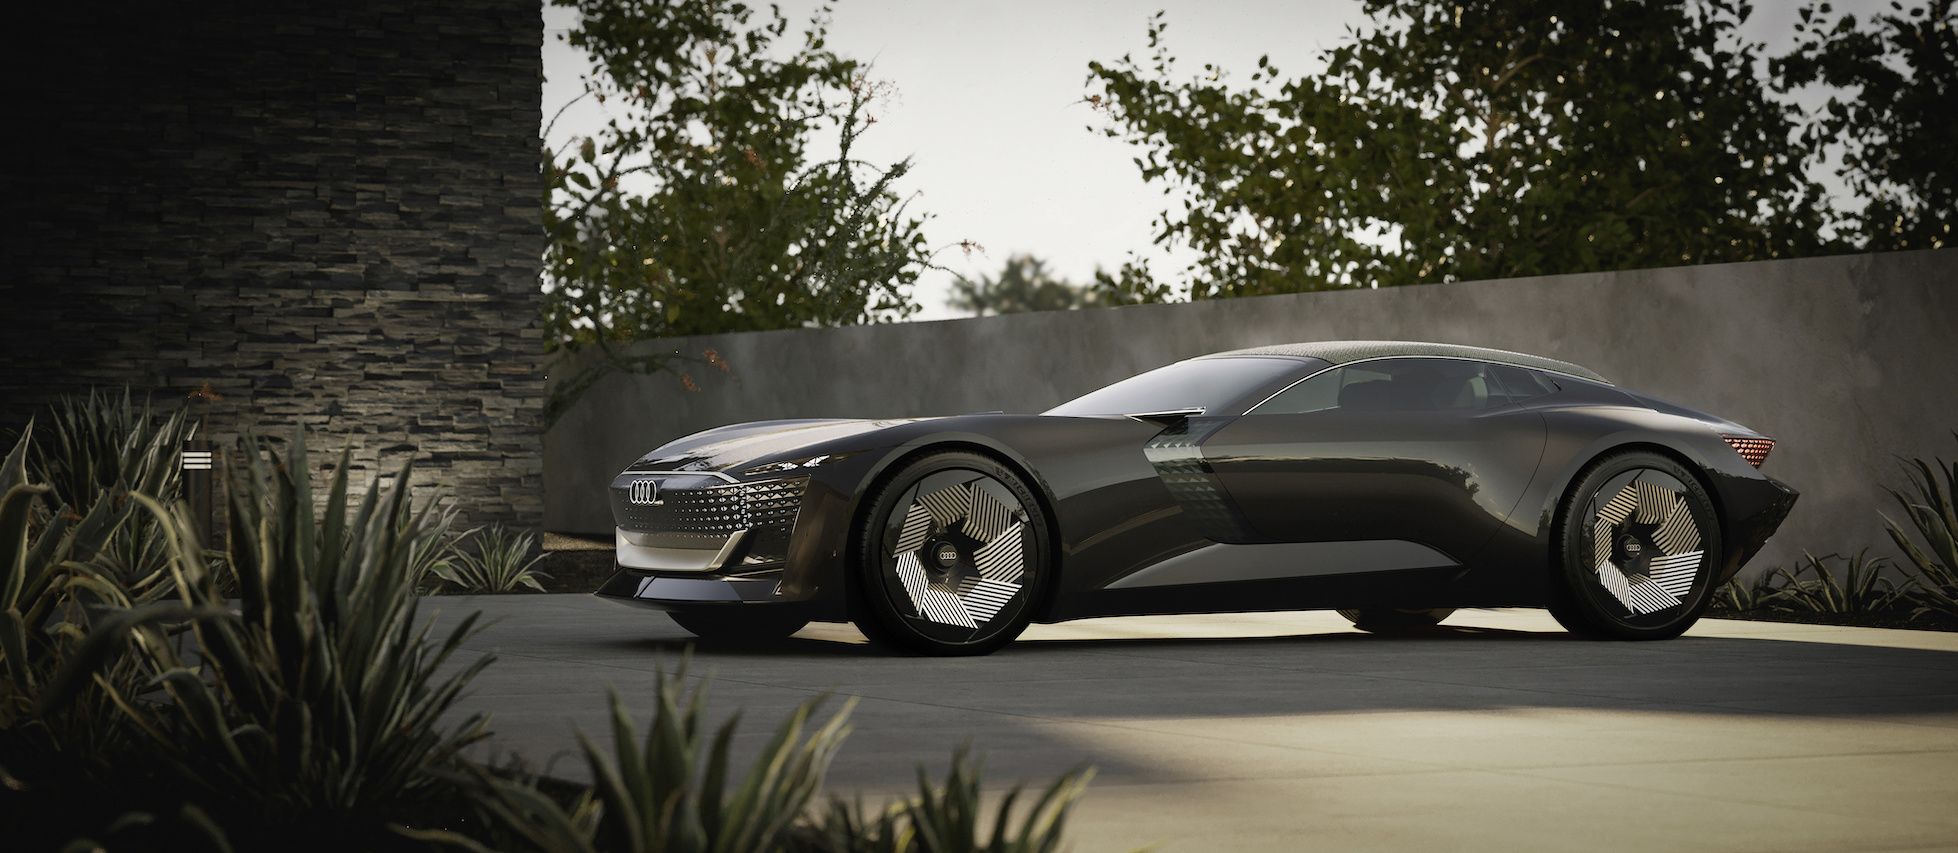 Audi presenta Skysphere, ¡un auto increíble!